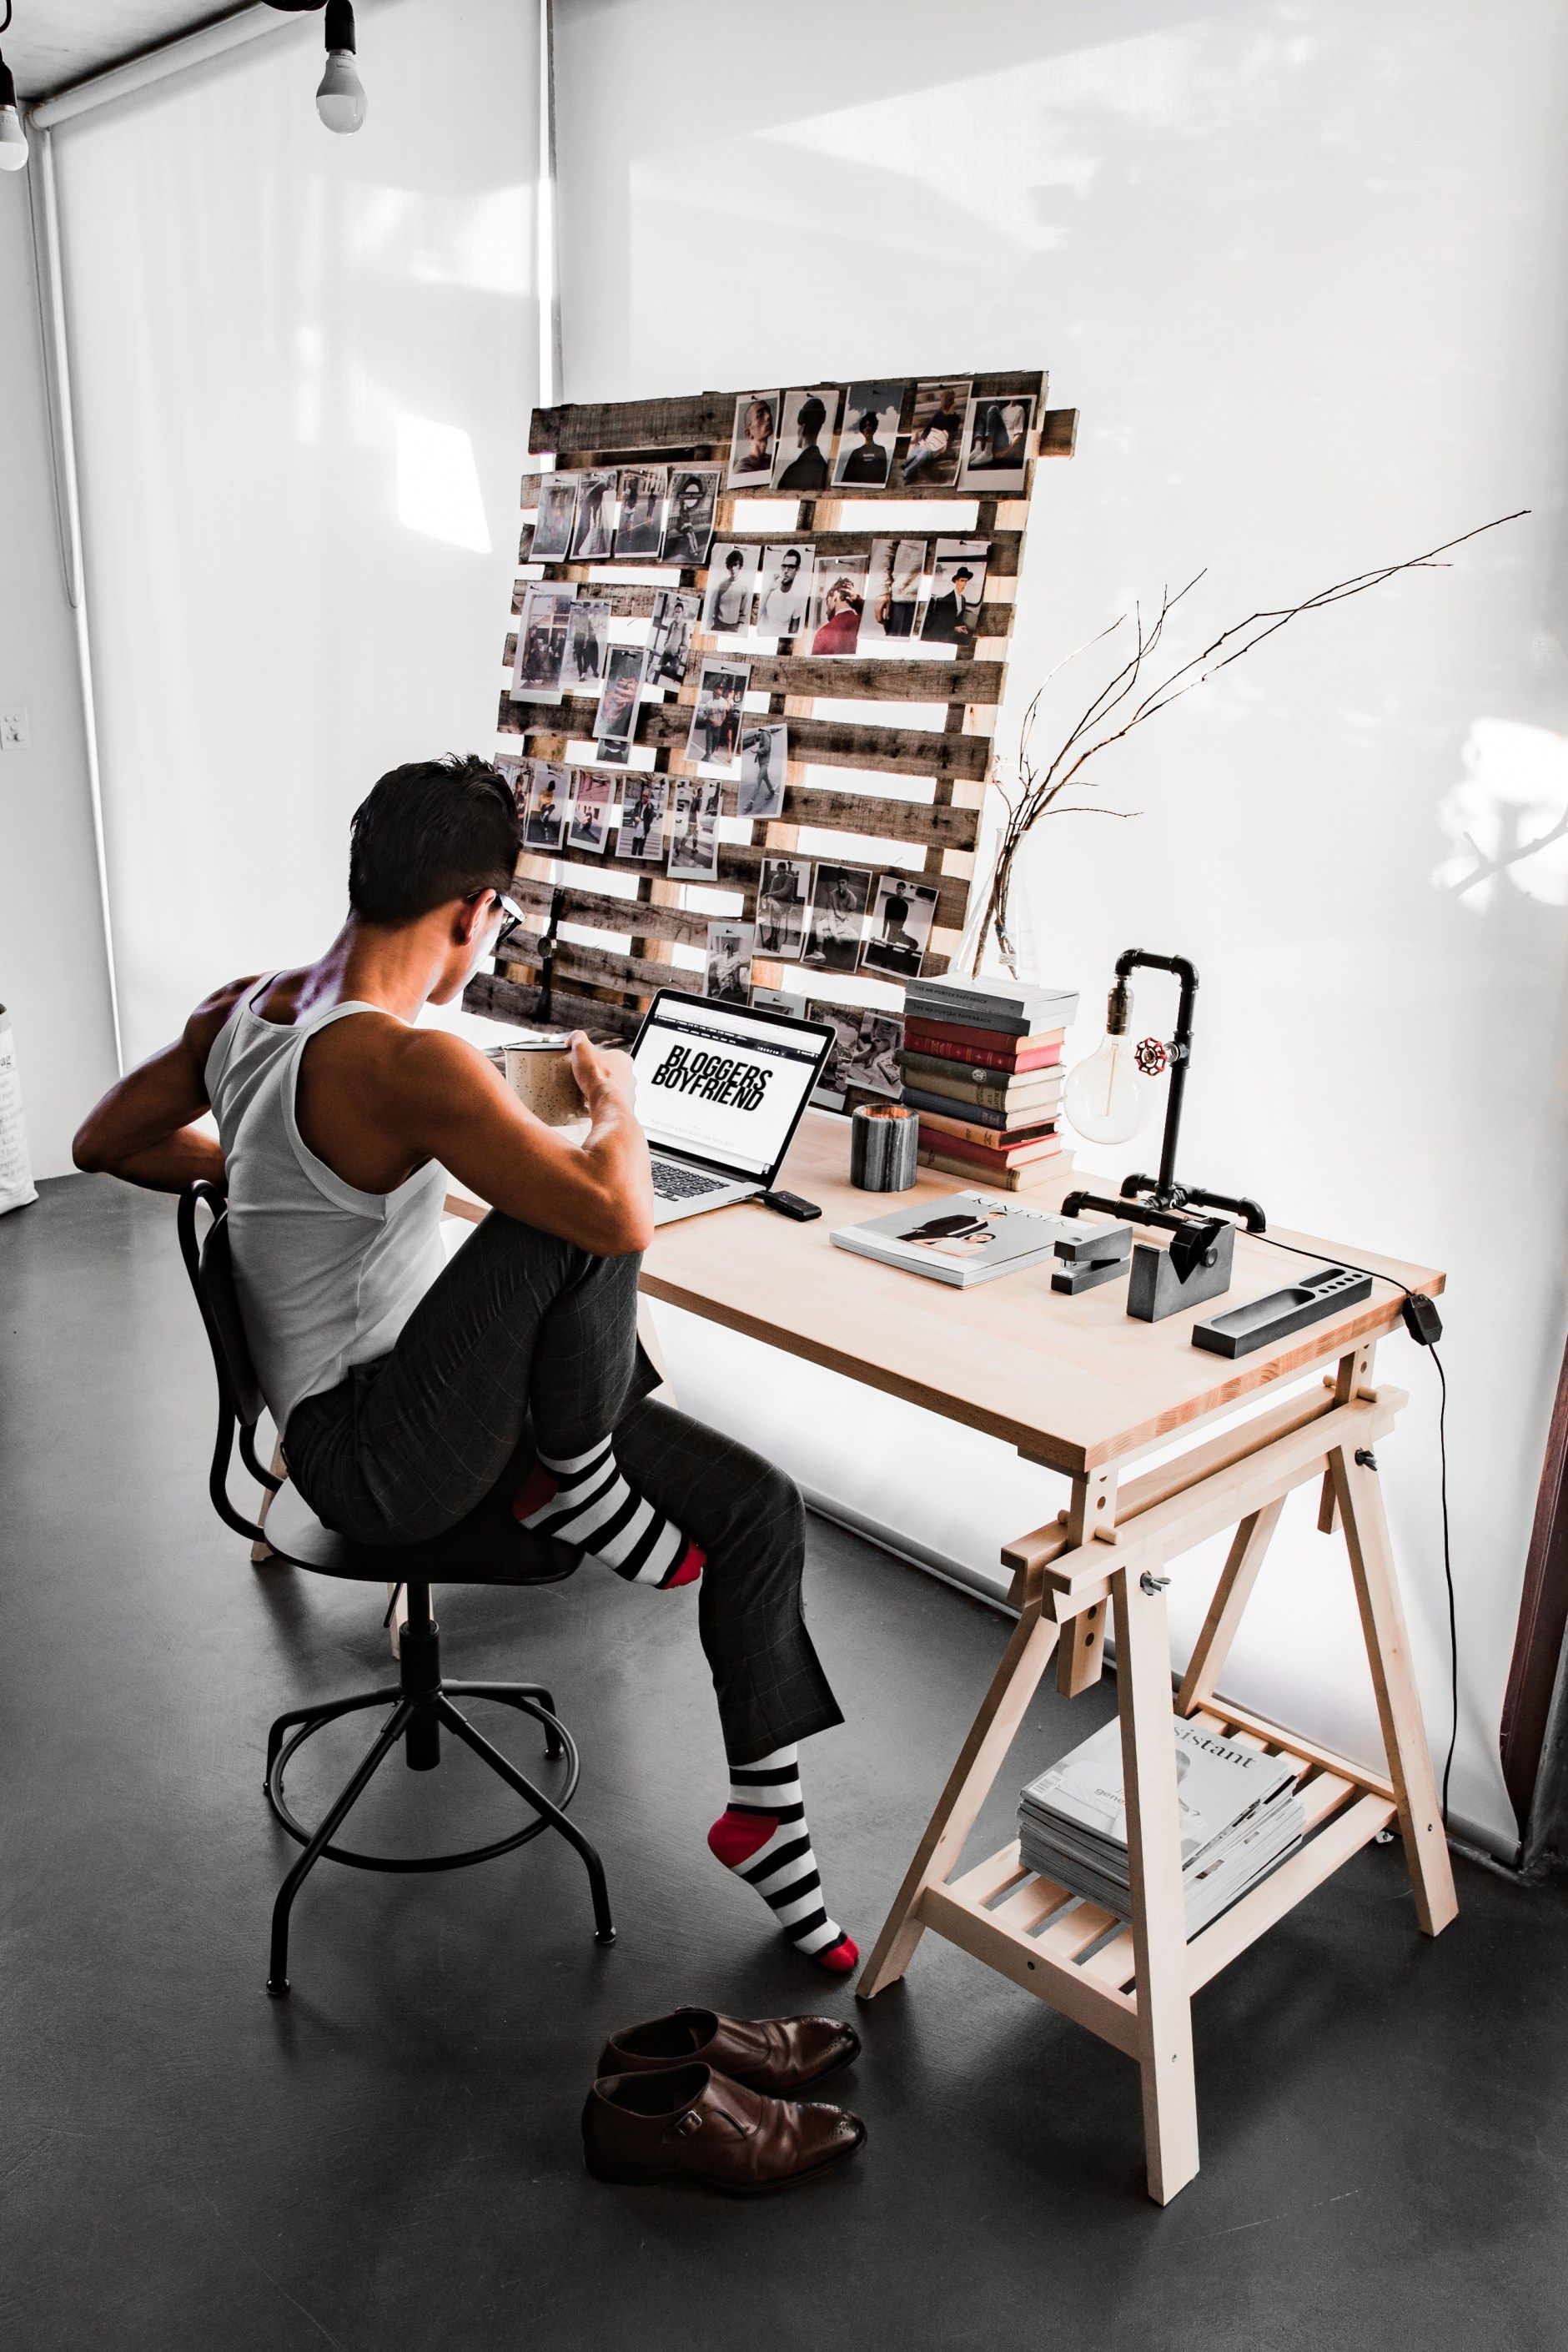 ce042b073 http   instagram.com Bloggers boyfriend Industrial warehouse Interior  studio blogger Ikea Australia